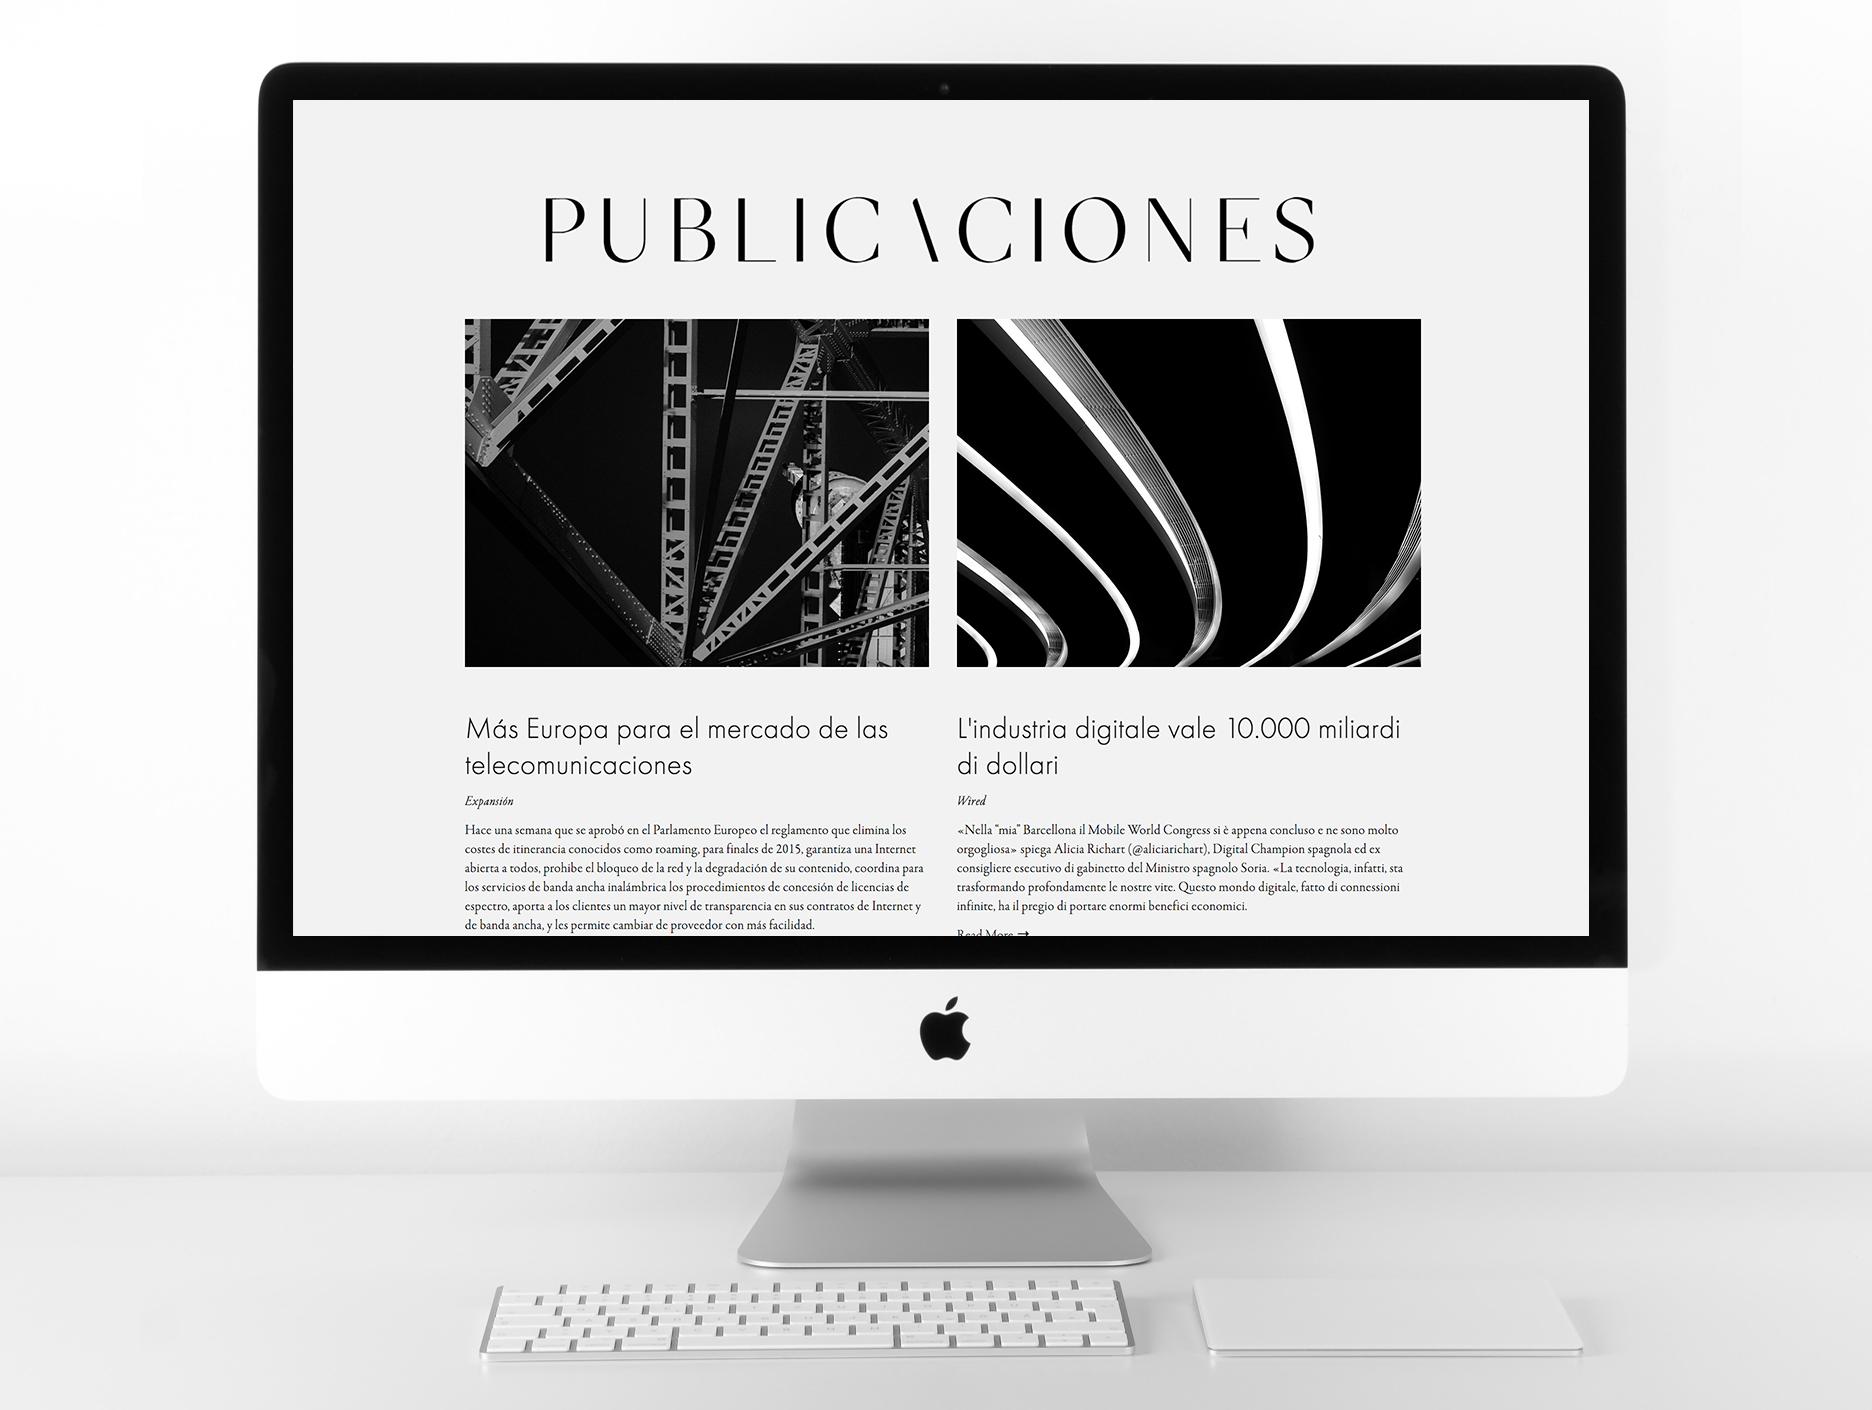 pagina-web-06.jpg